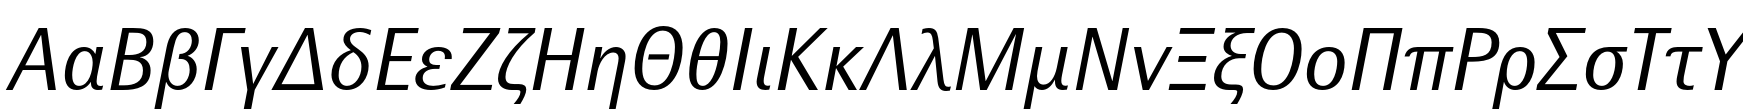 AgfaRotisSemisans-Italic.otf